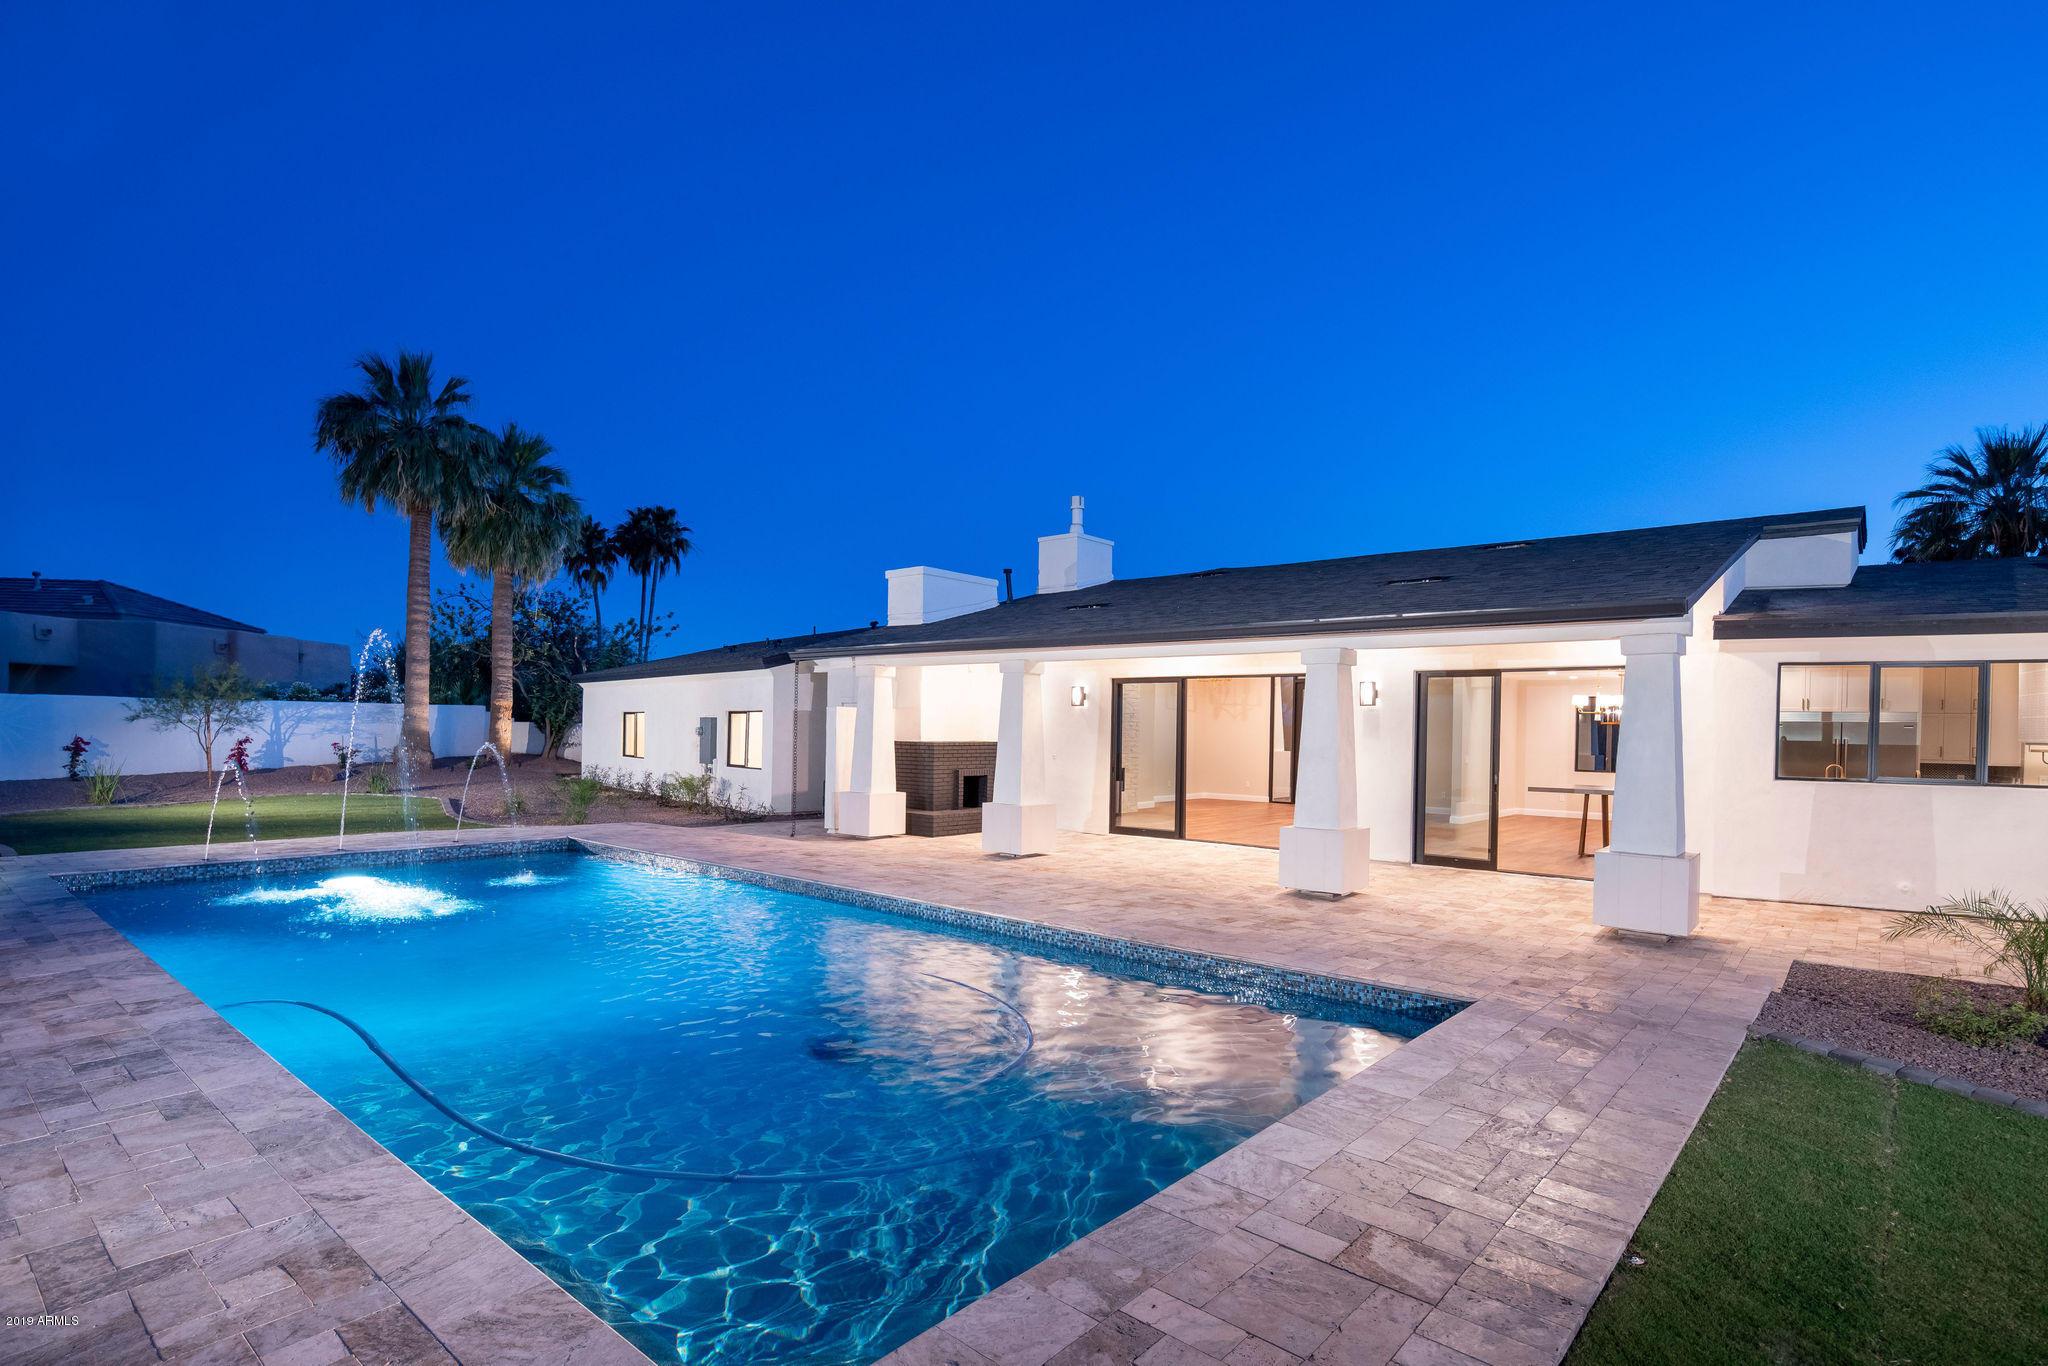 MLS 5933350 4601 N ROYAL VIEW Drive, Phoenix, AZ 85018 Phoenix AZ Four Bedroom